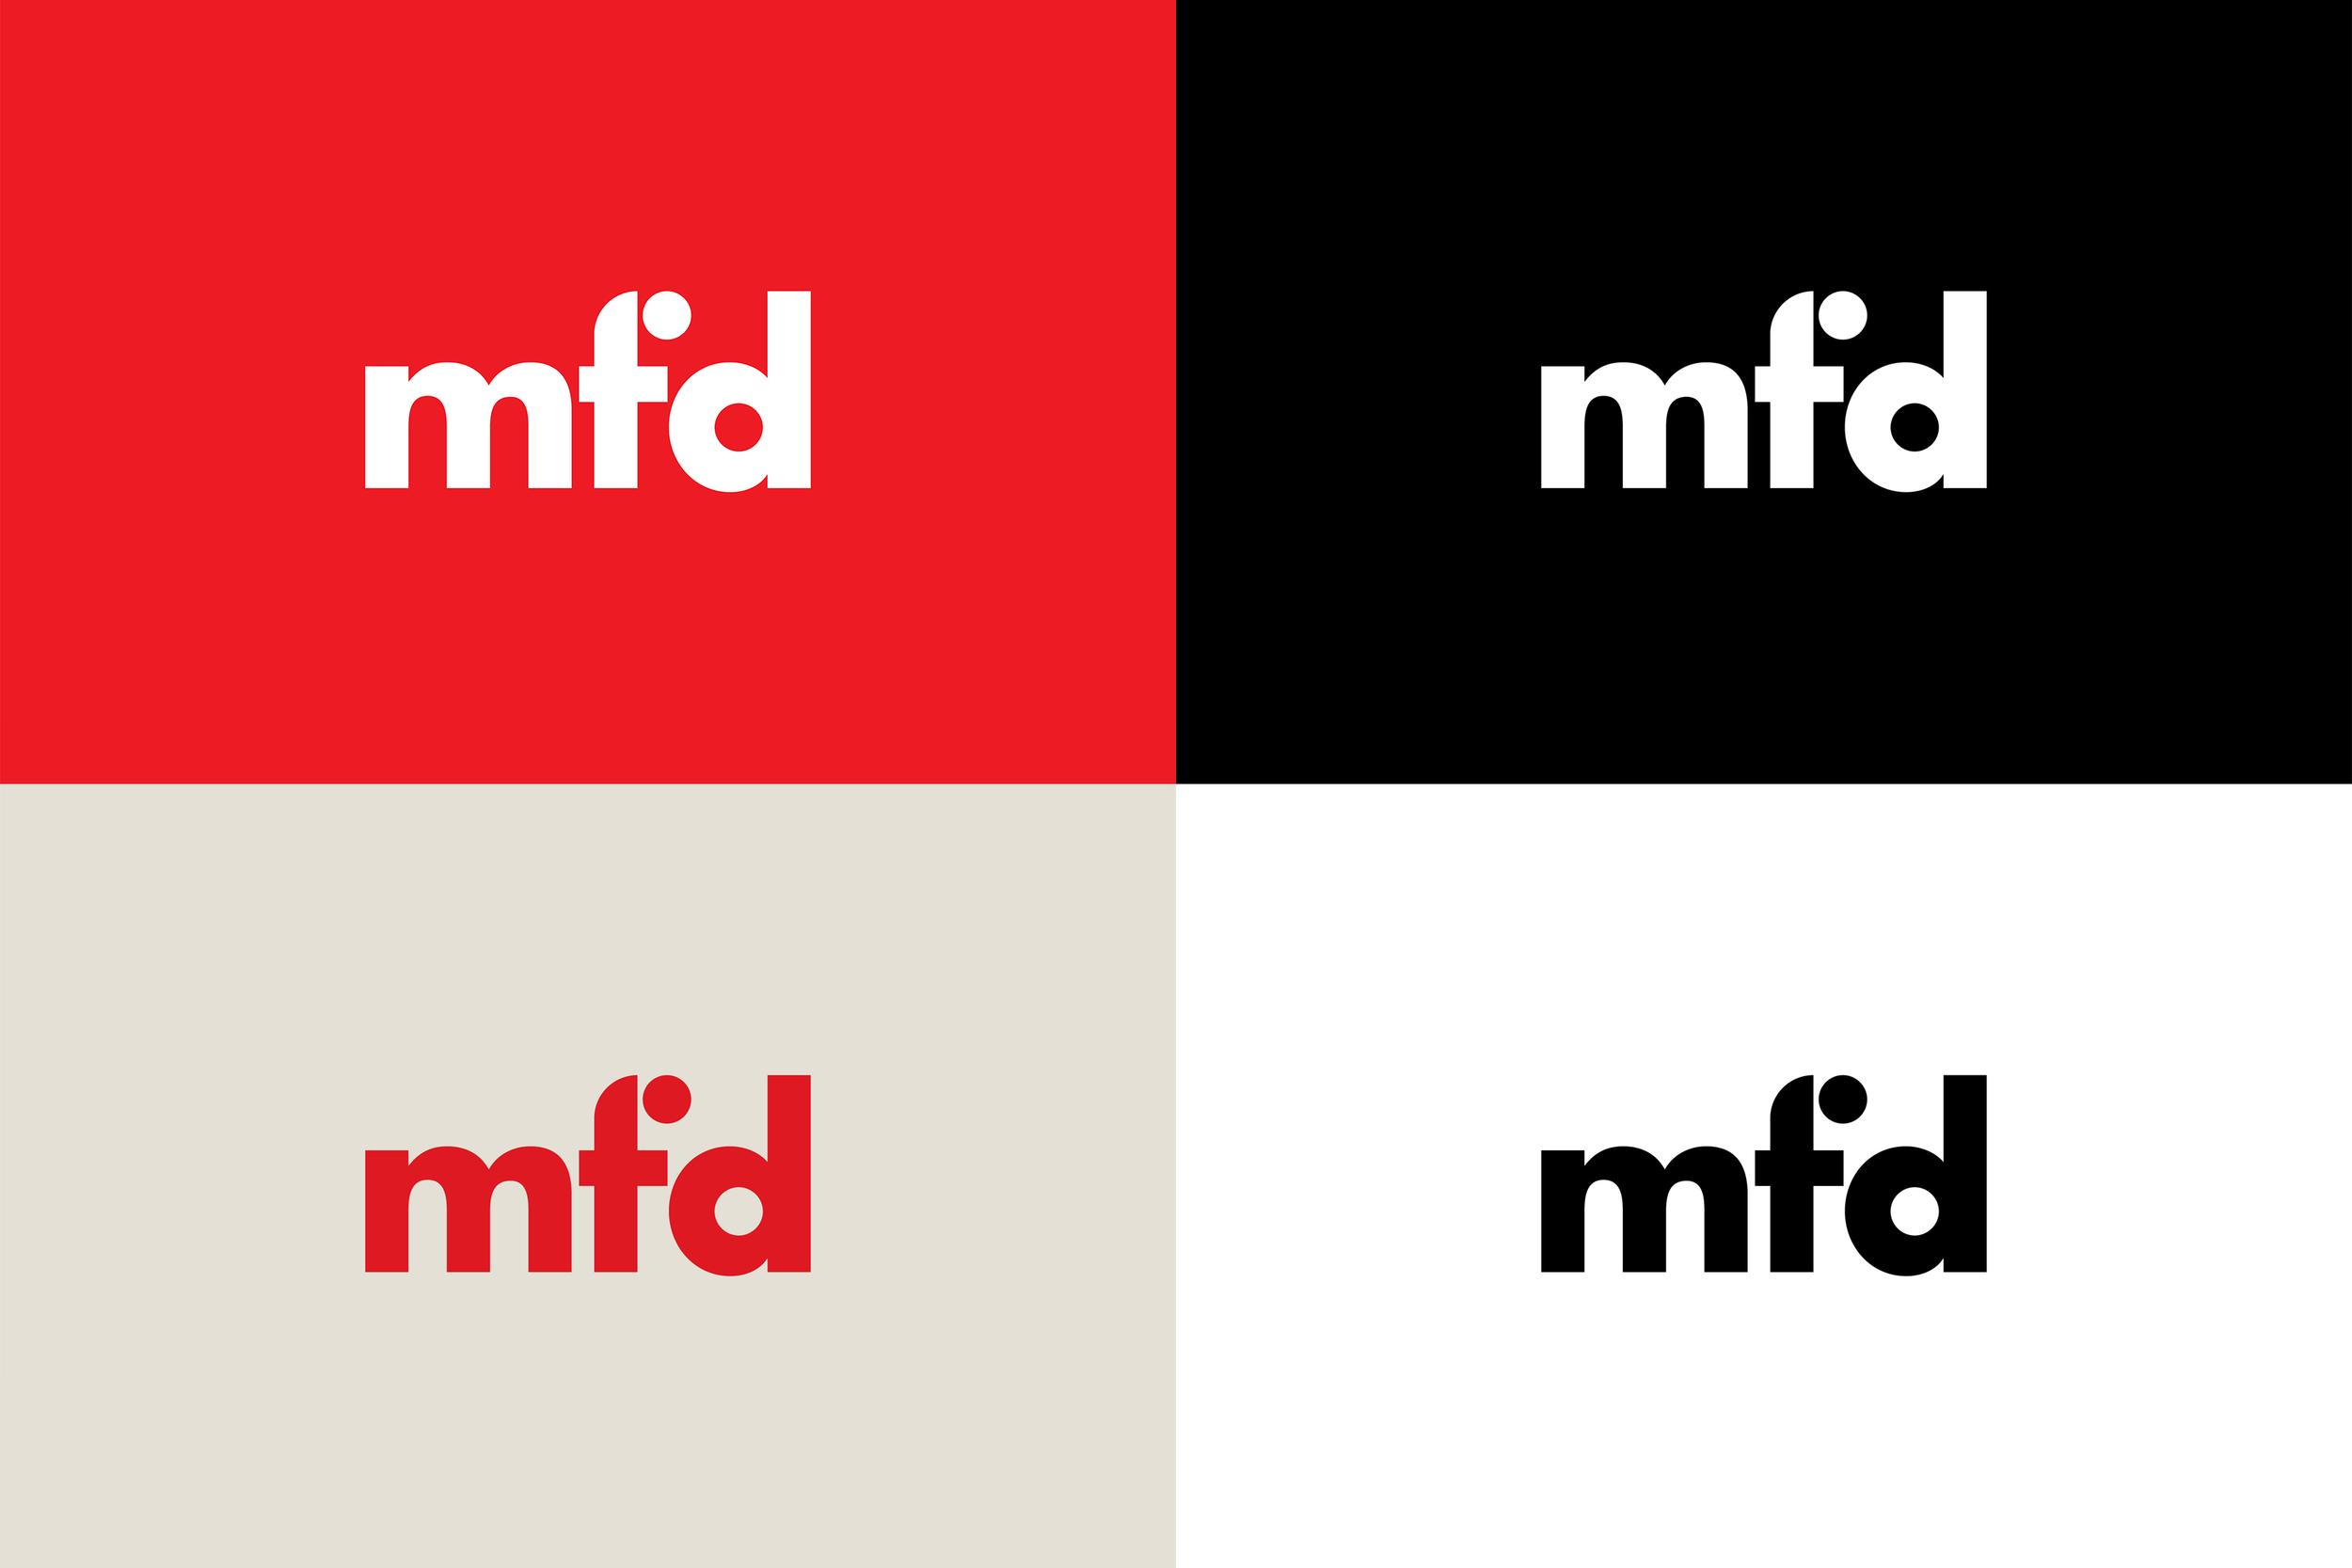 mchiao_mfd_logo_4up.jpg